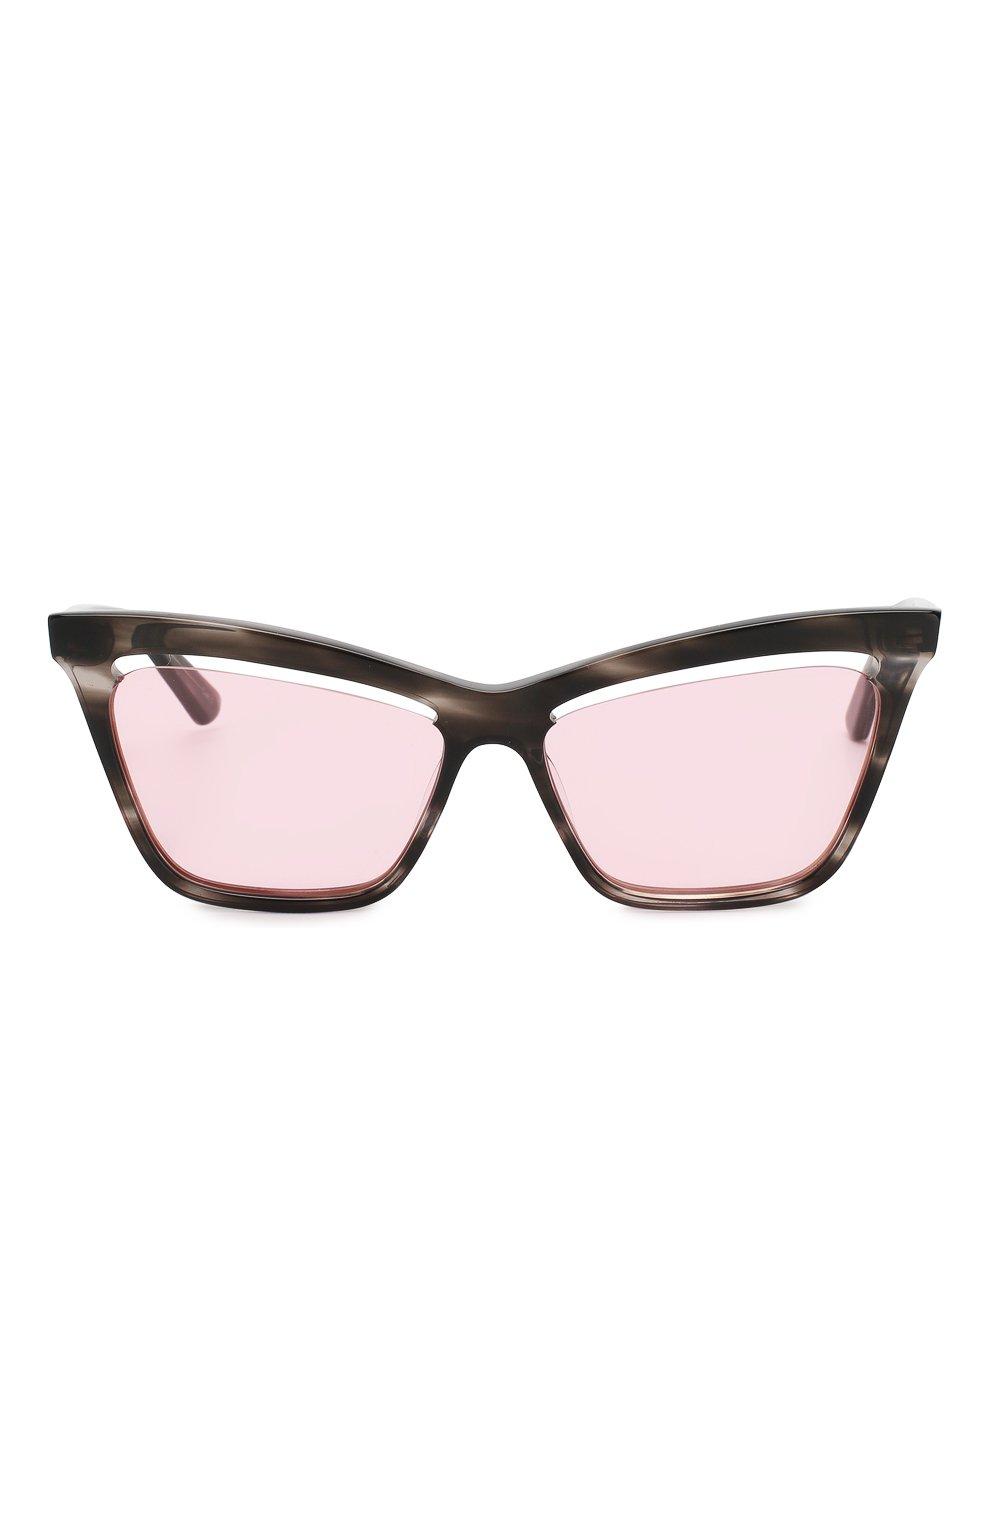 Женские солнцезащитные очки MCQ SWALLOW розового цвета, арт. MQ0156 003 | Фото 3 (Тип очков: С/з; Статус проверки: Проверено, Проверена категория; Оптика Гендер: оптика-женское; Очки форма: Cat-eye)